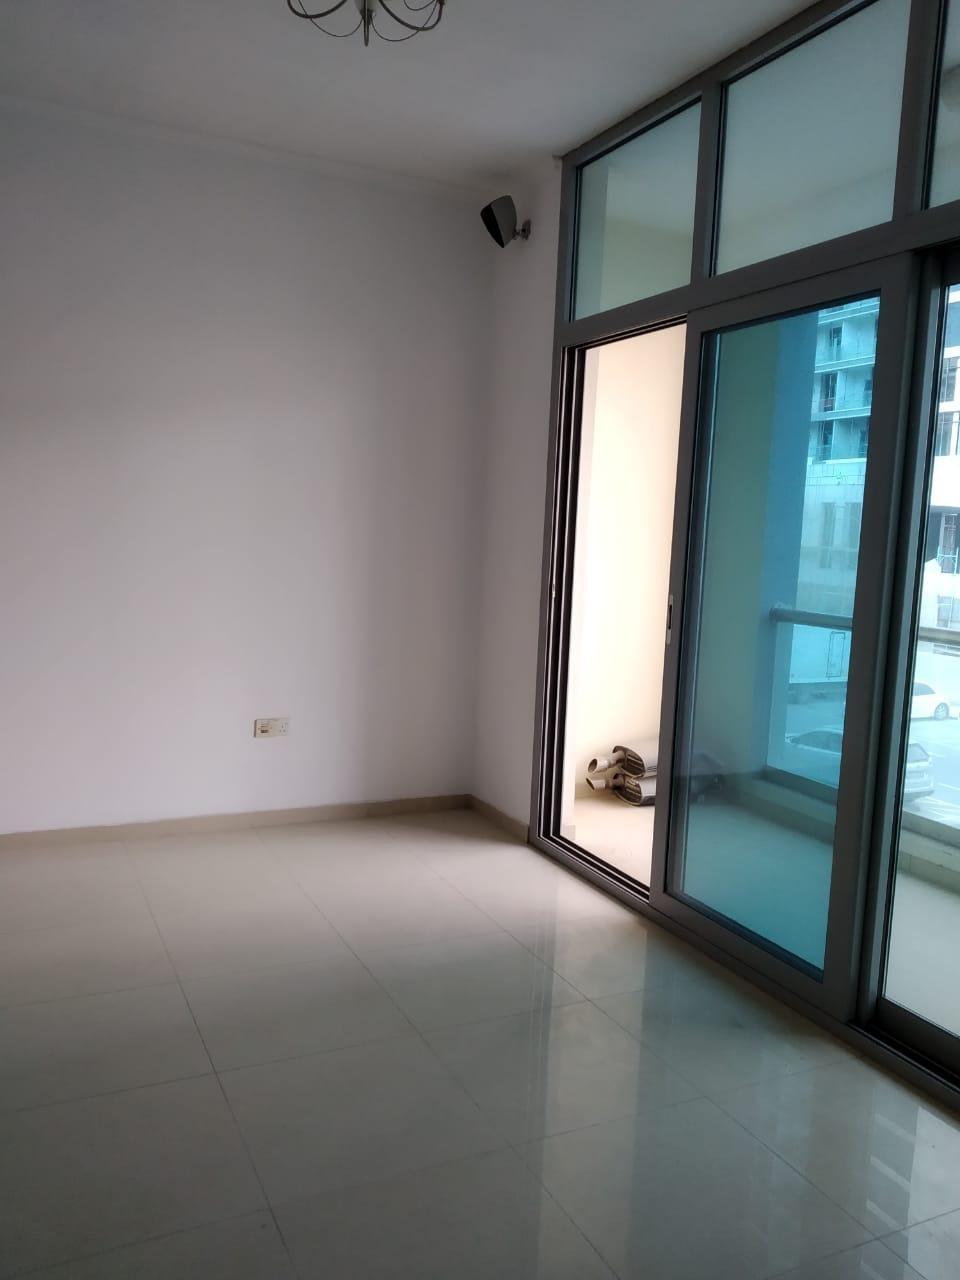 DUbai Marina DEC tower 1 Vacant Studio with balcony semi furnished marina view Rent 38k/- by 4 cheqs